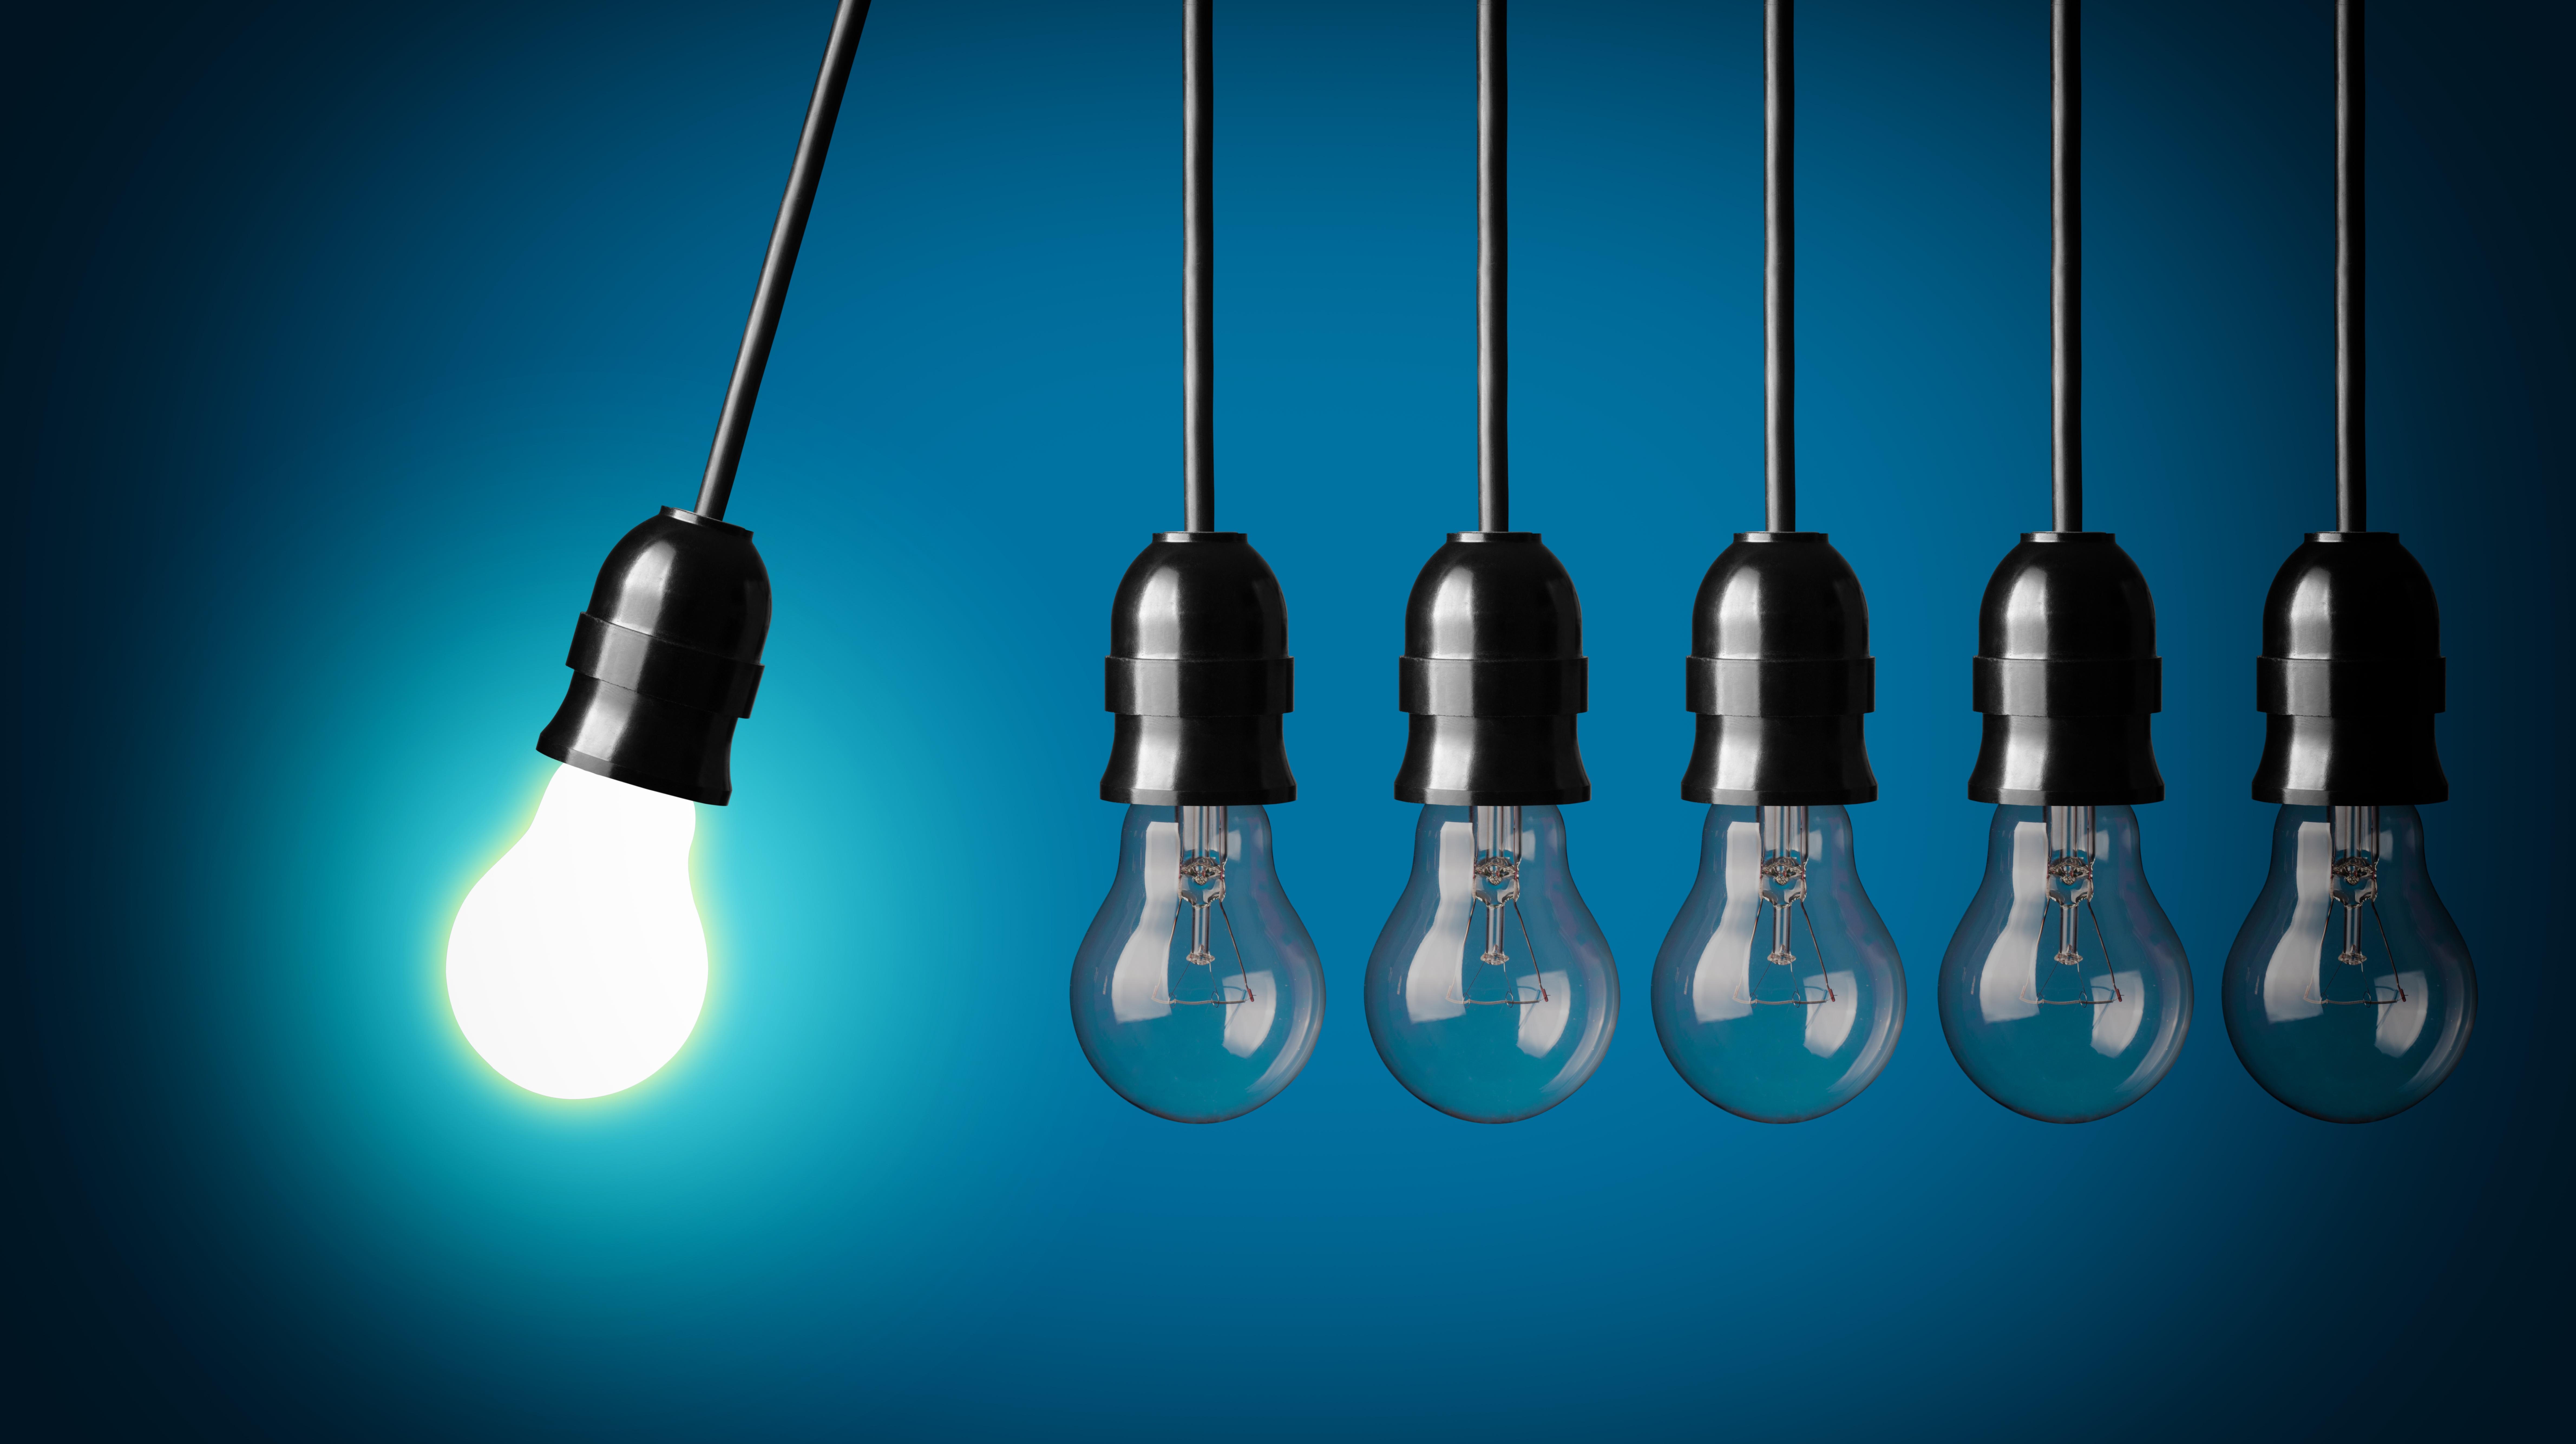 innovacion para tu negocio